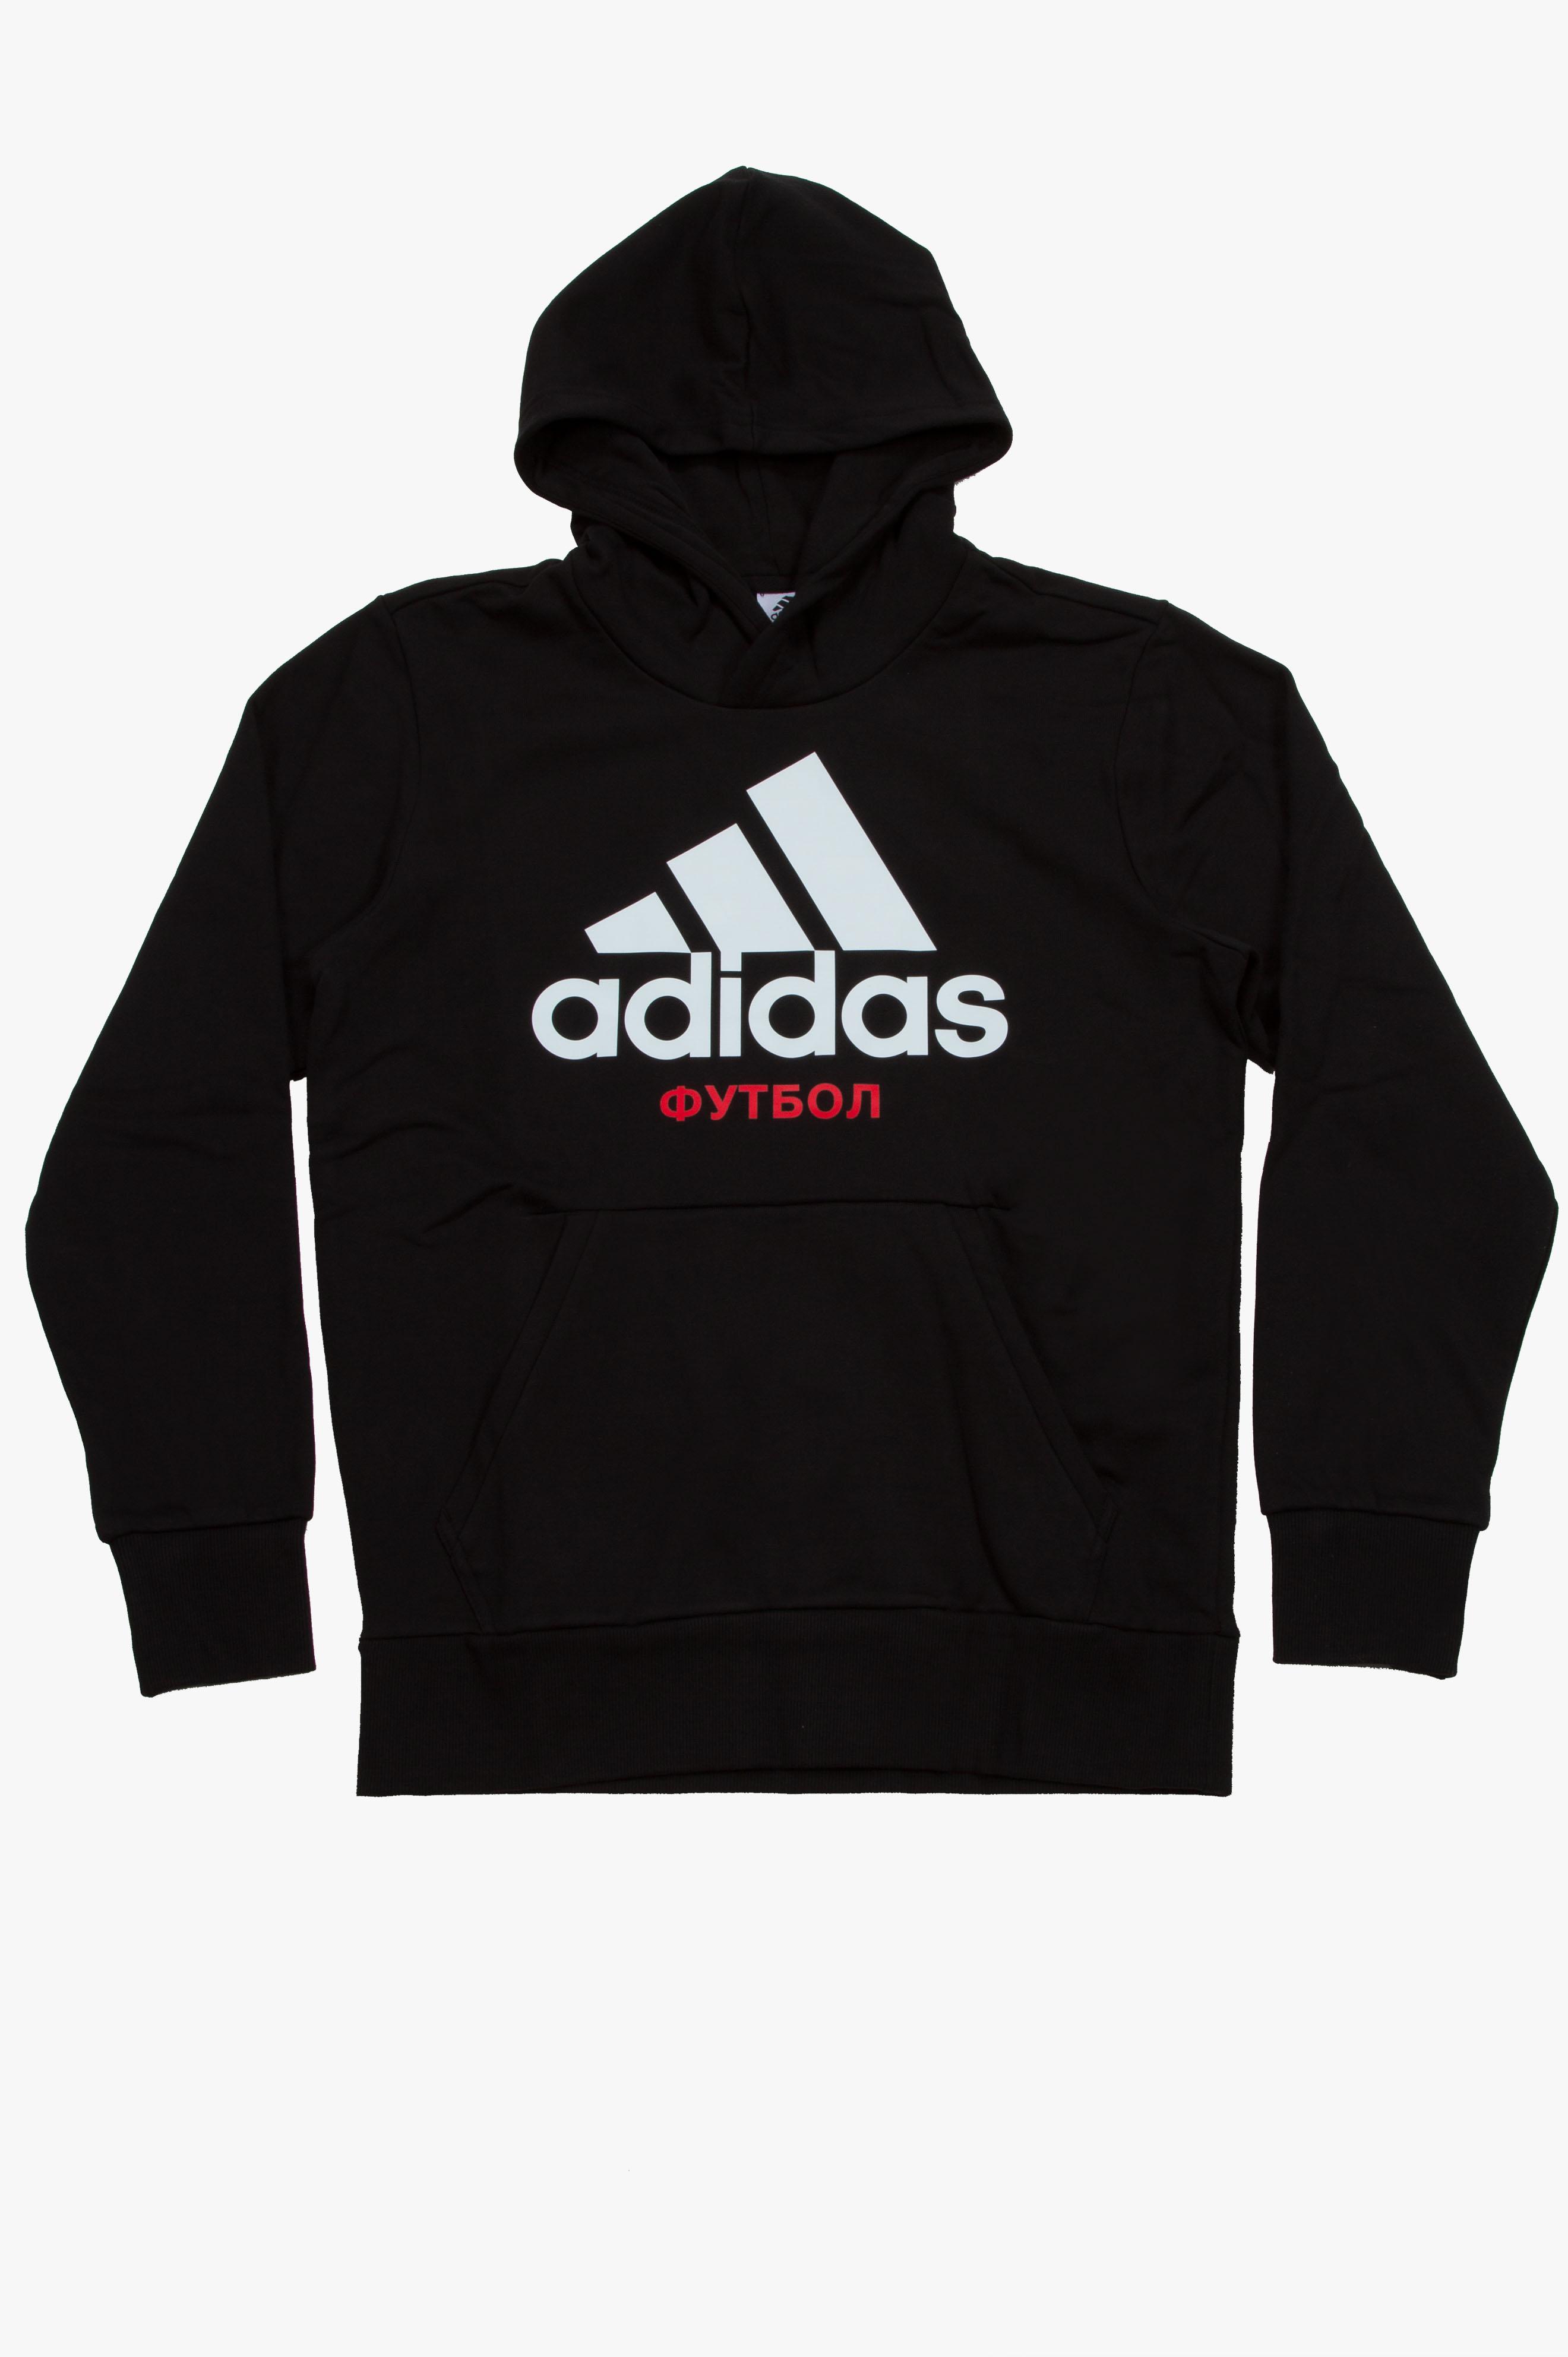 x Adidas Hoodie Black